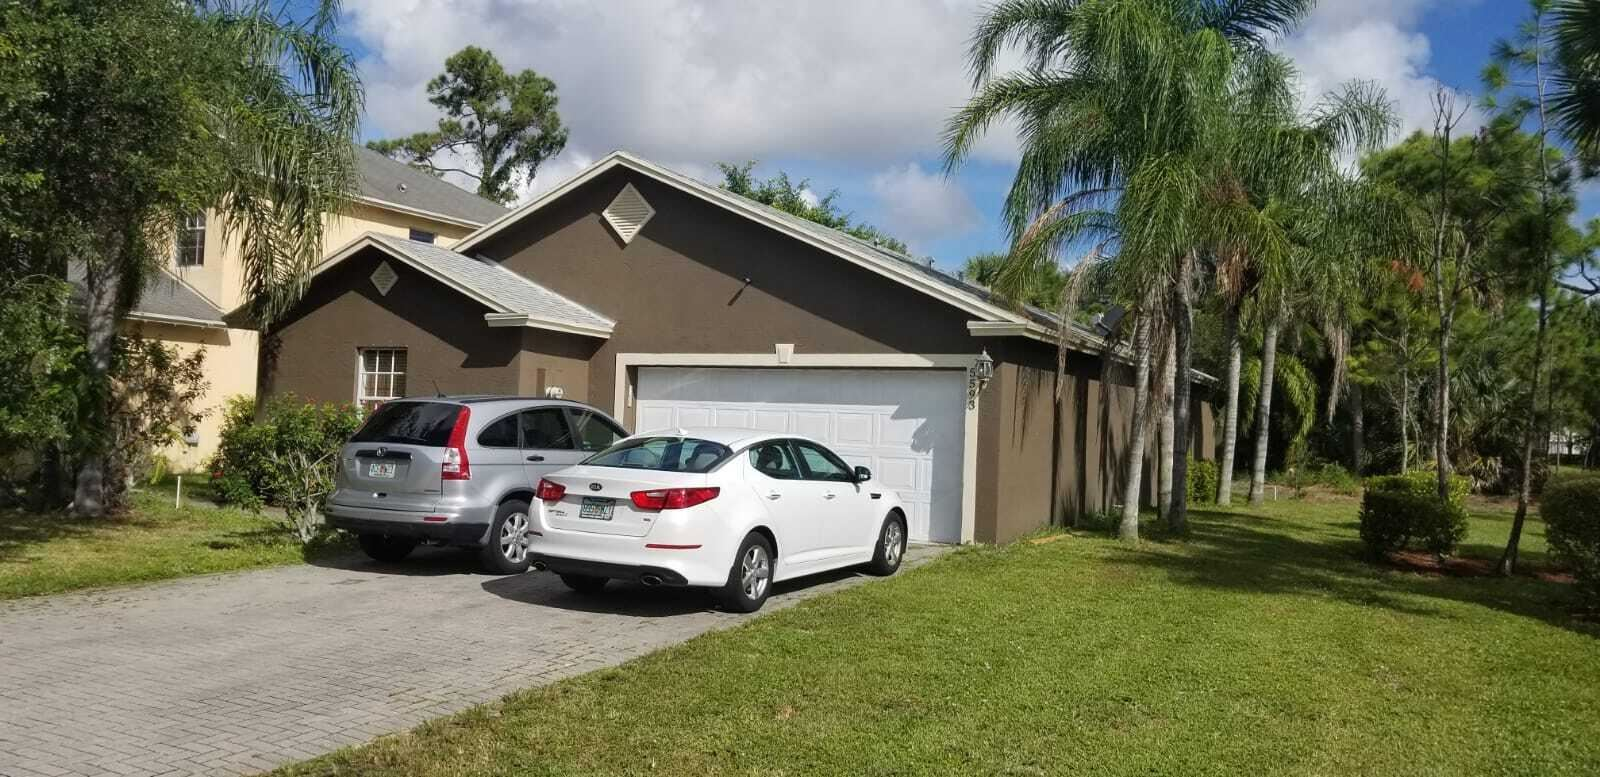 5593 Rambler Rose Way, West Palm Beach, FL 33415 - MLS#: RX-10742933